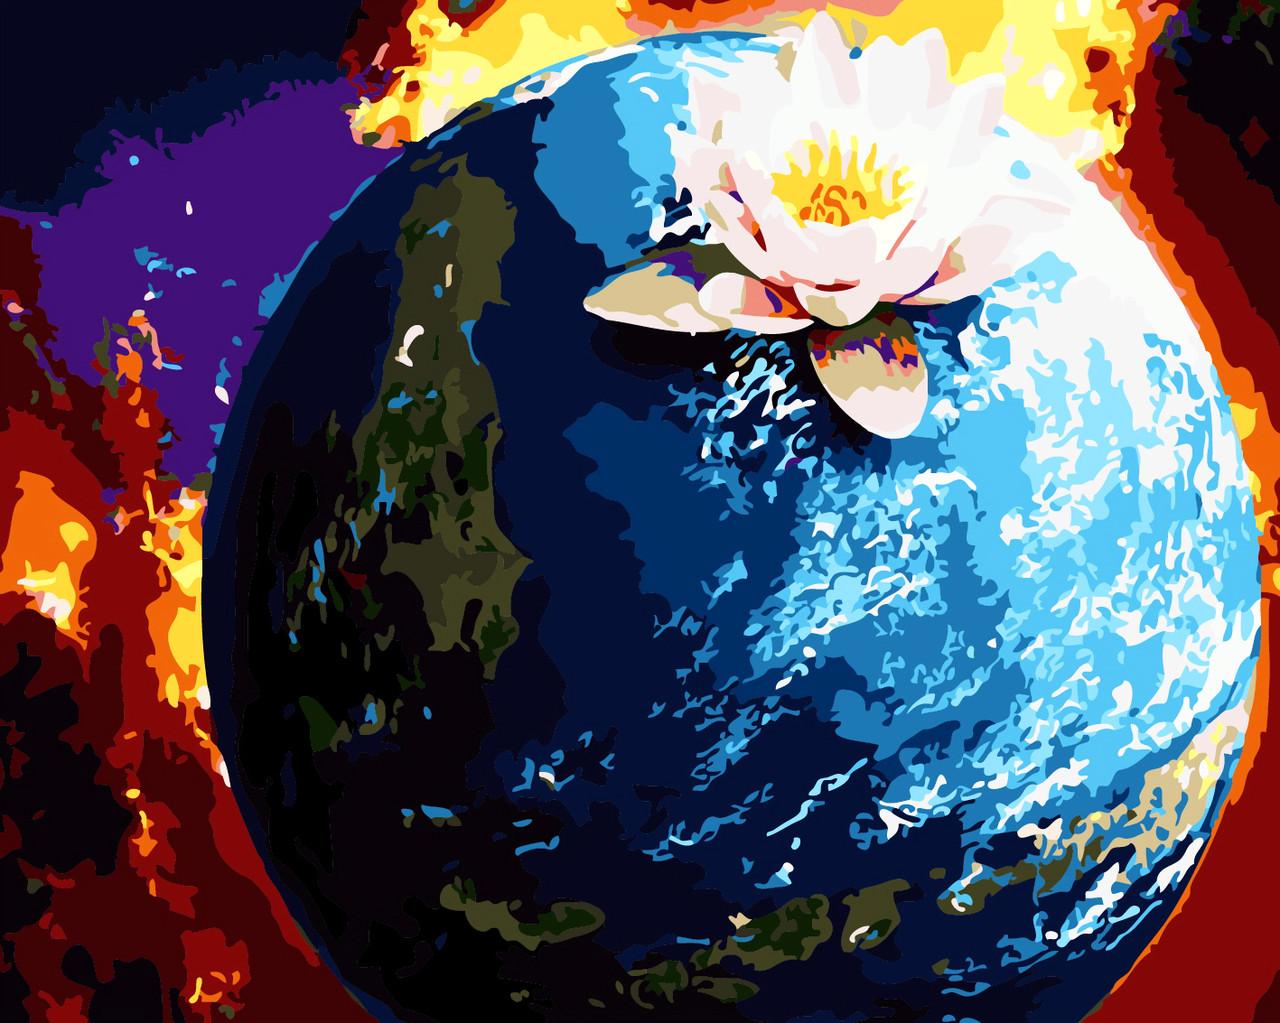 Художественный творческий набор, картина по номерам Планета, 40x50 см, «Art Story» (AS0309)